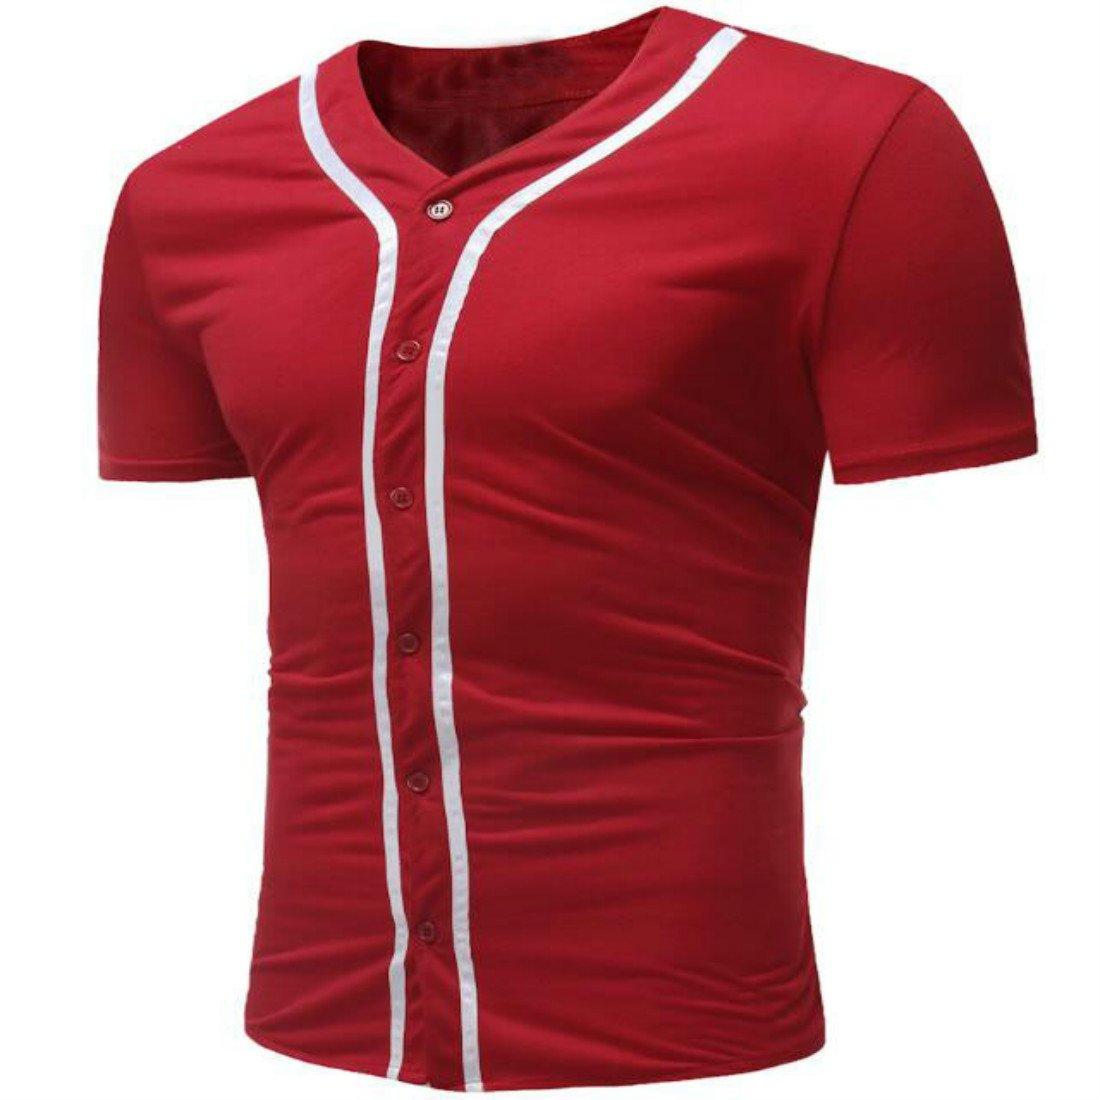 0f420acd6 Button Down Baseball Jersey Shirts « Alzheimer's Network of Oregon